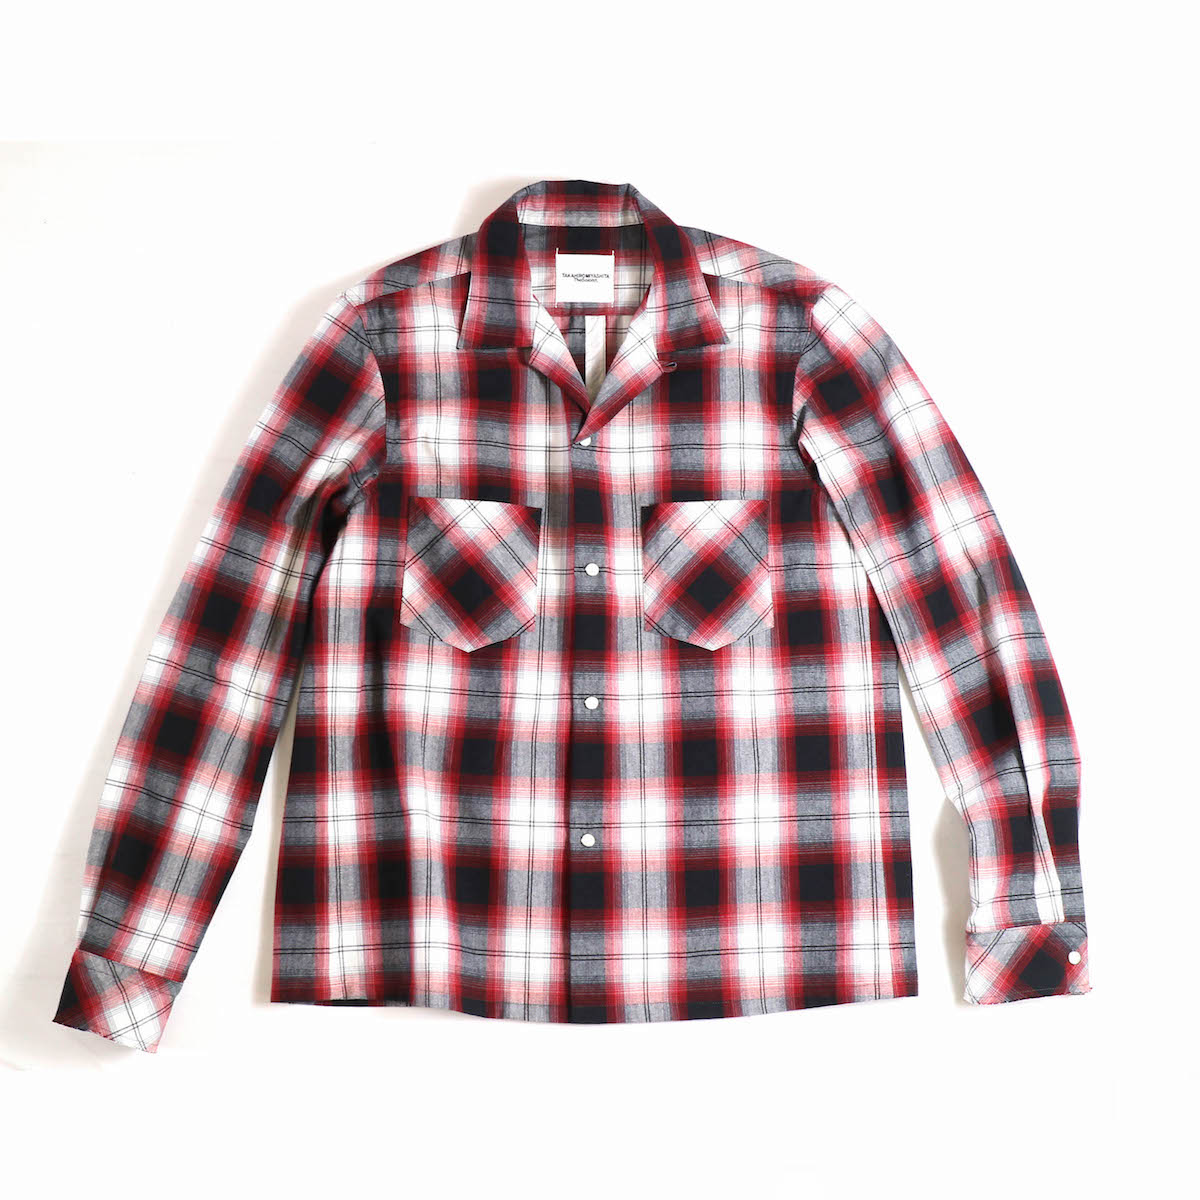 TAKAHIROMIYASHITATheSoloist. / sws.0012bSS18 work shirt. (ombre check) -black × red